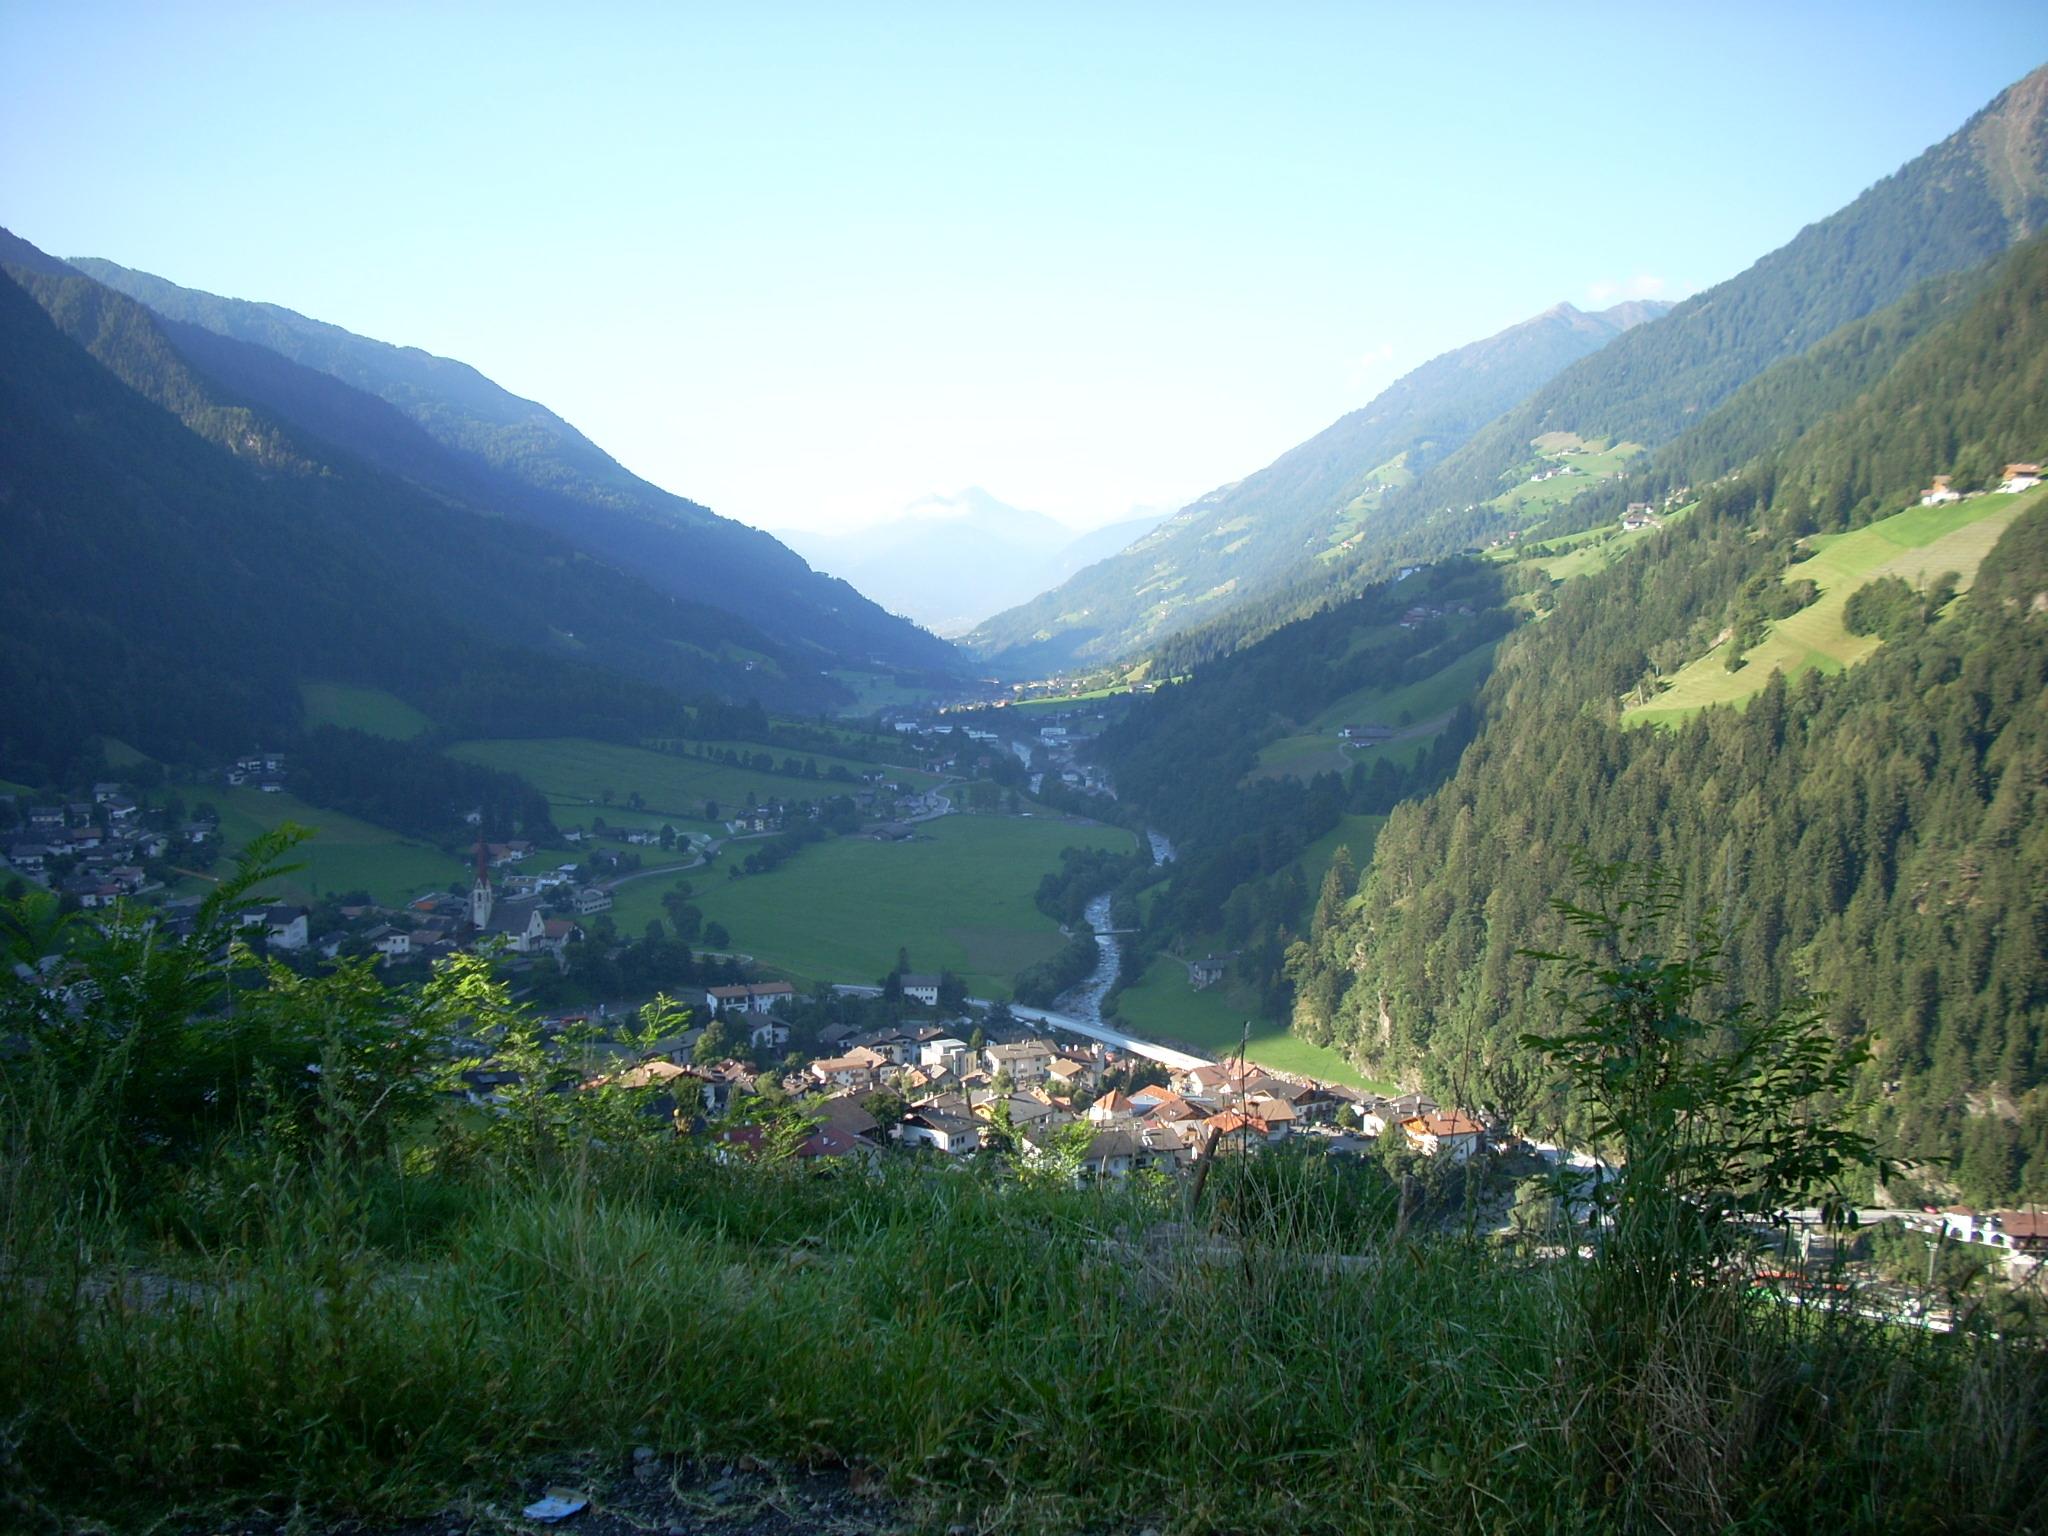 Mountains Landscapes Nature Forest Austria Valley Village #0DA2BE 2048x1536